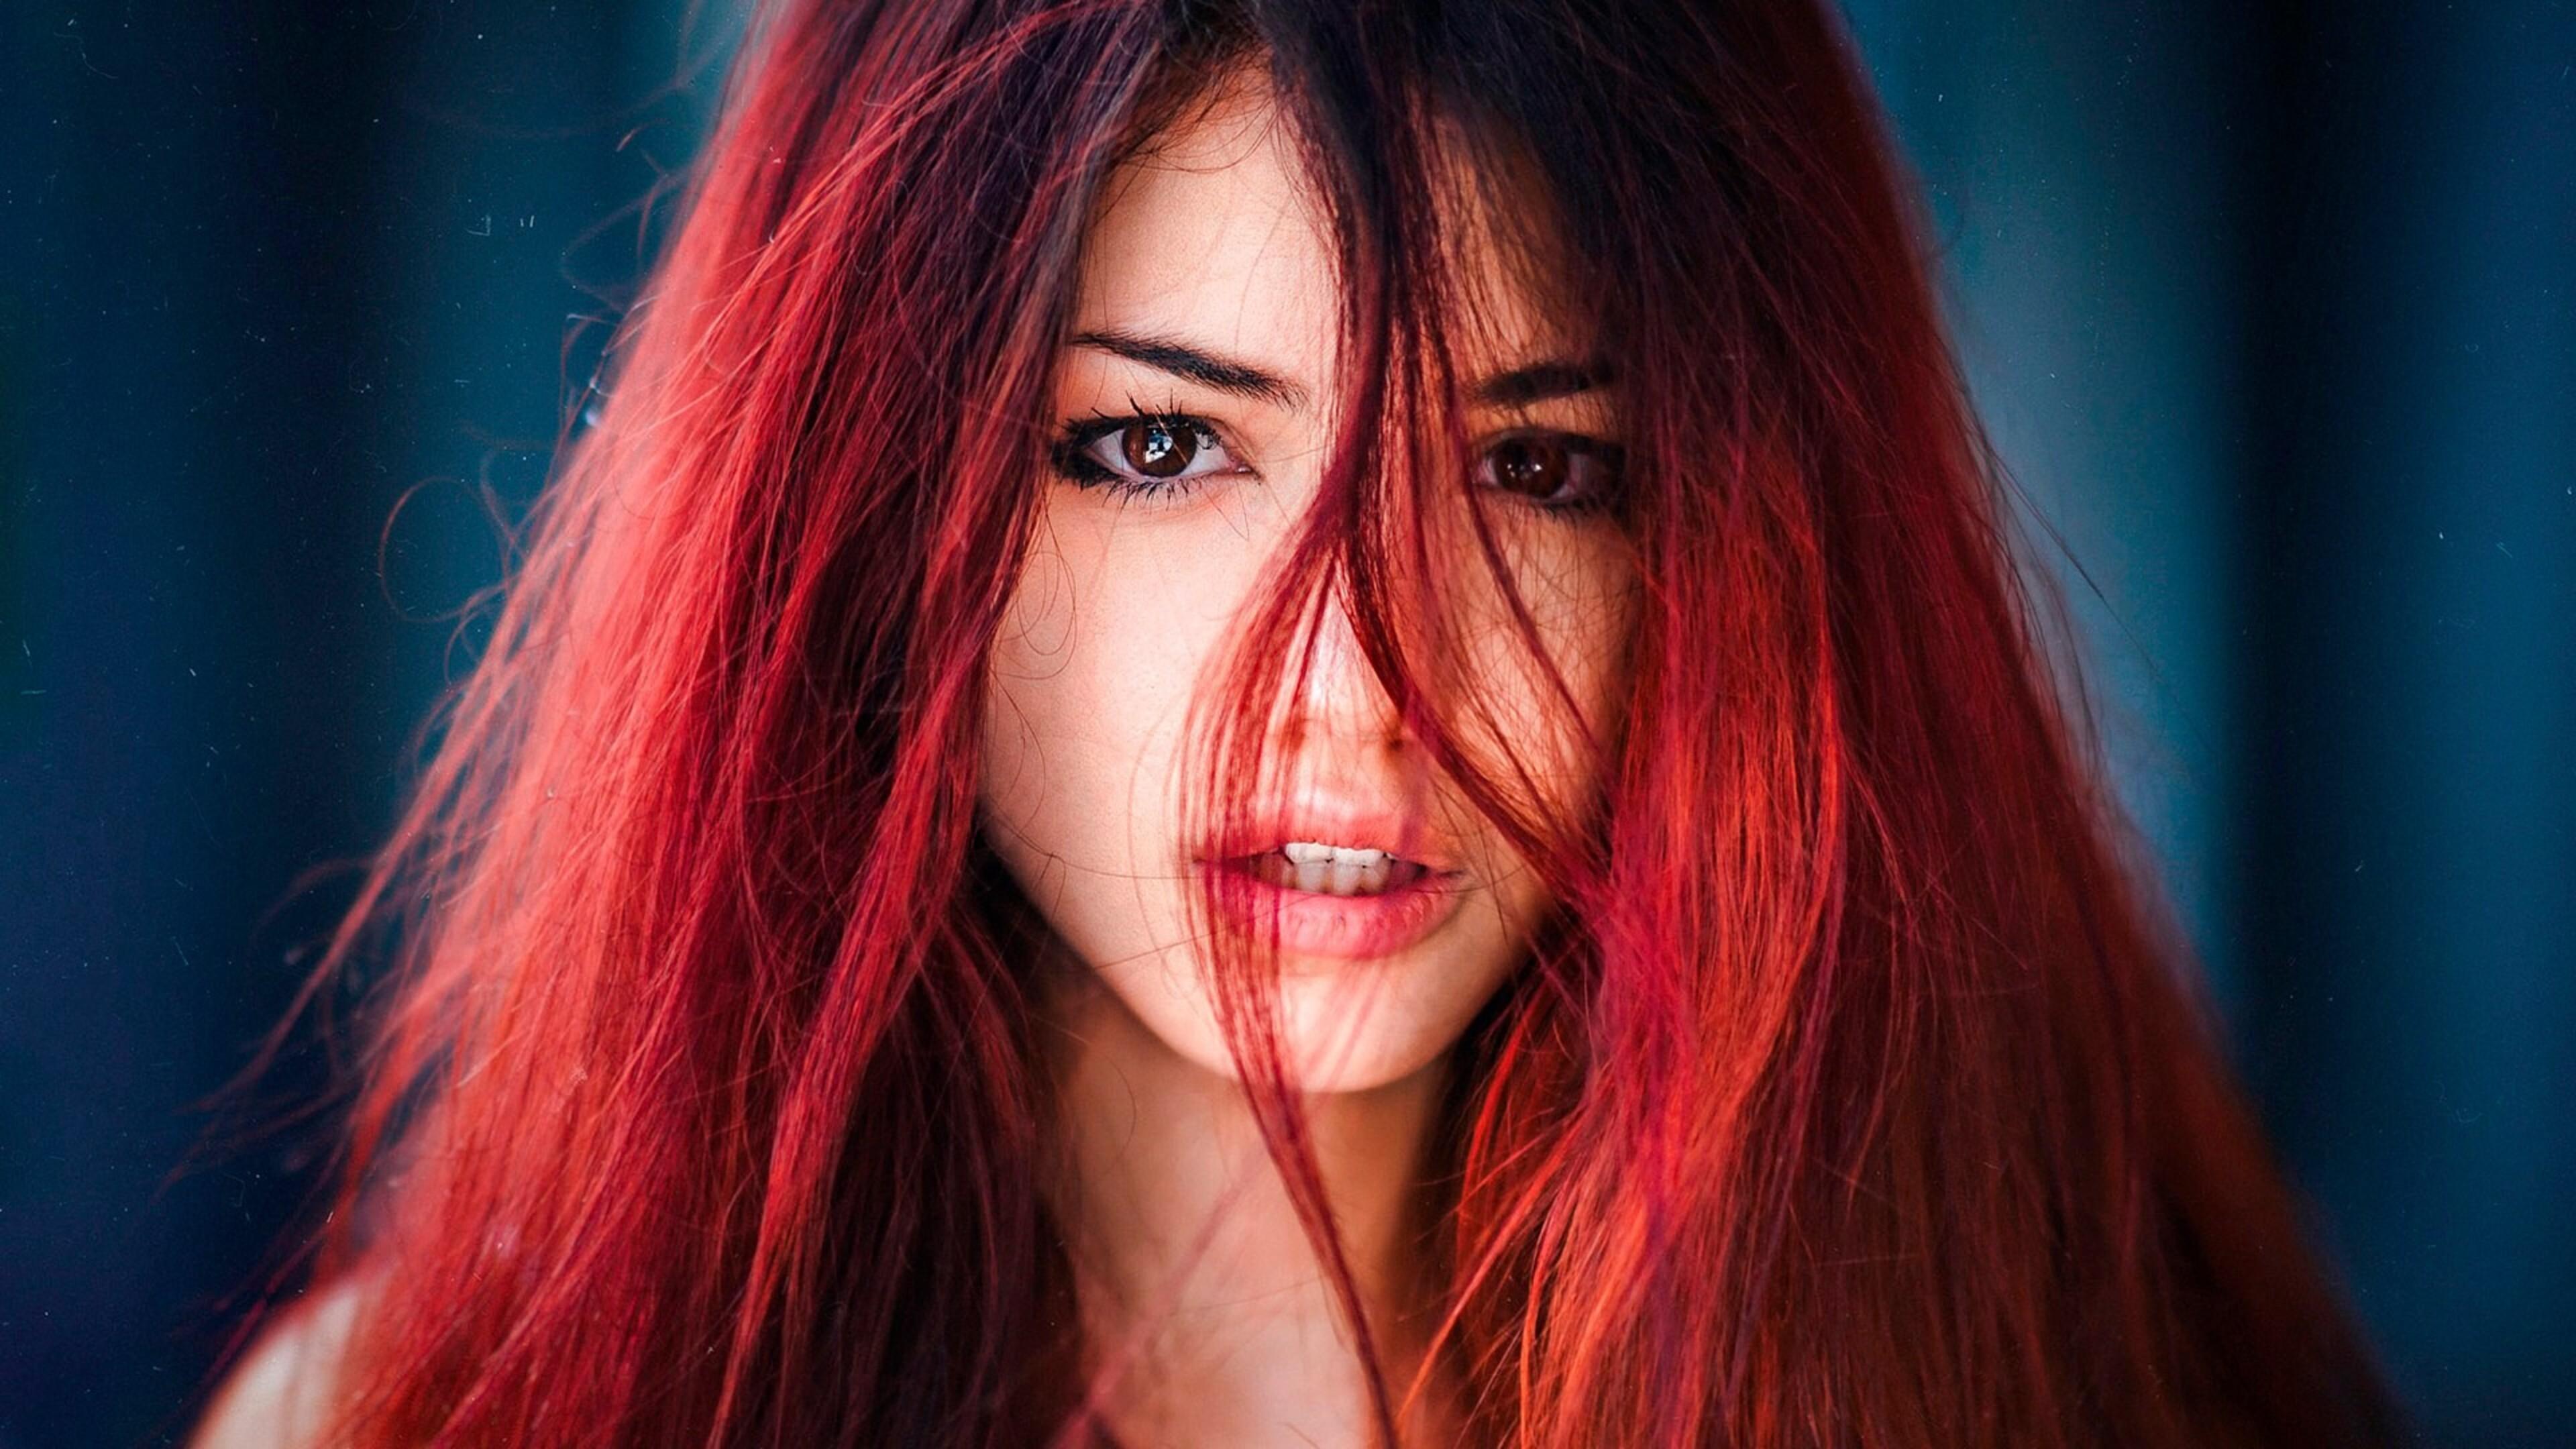 3840X2160 Redhead Women 4K Hd 4K Wallpapers, Images -5092